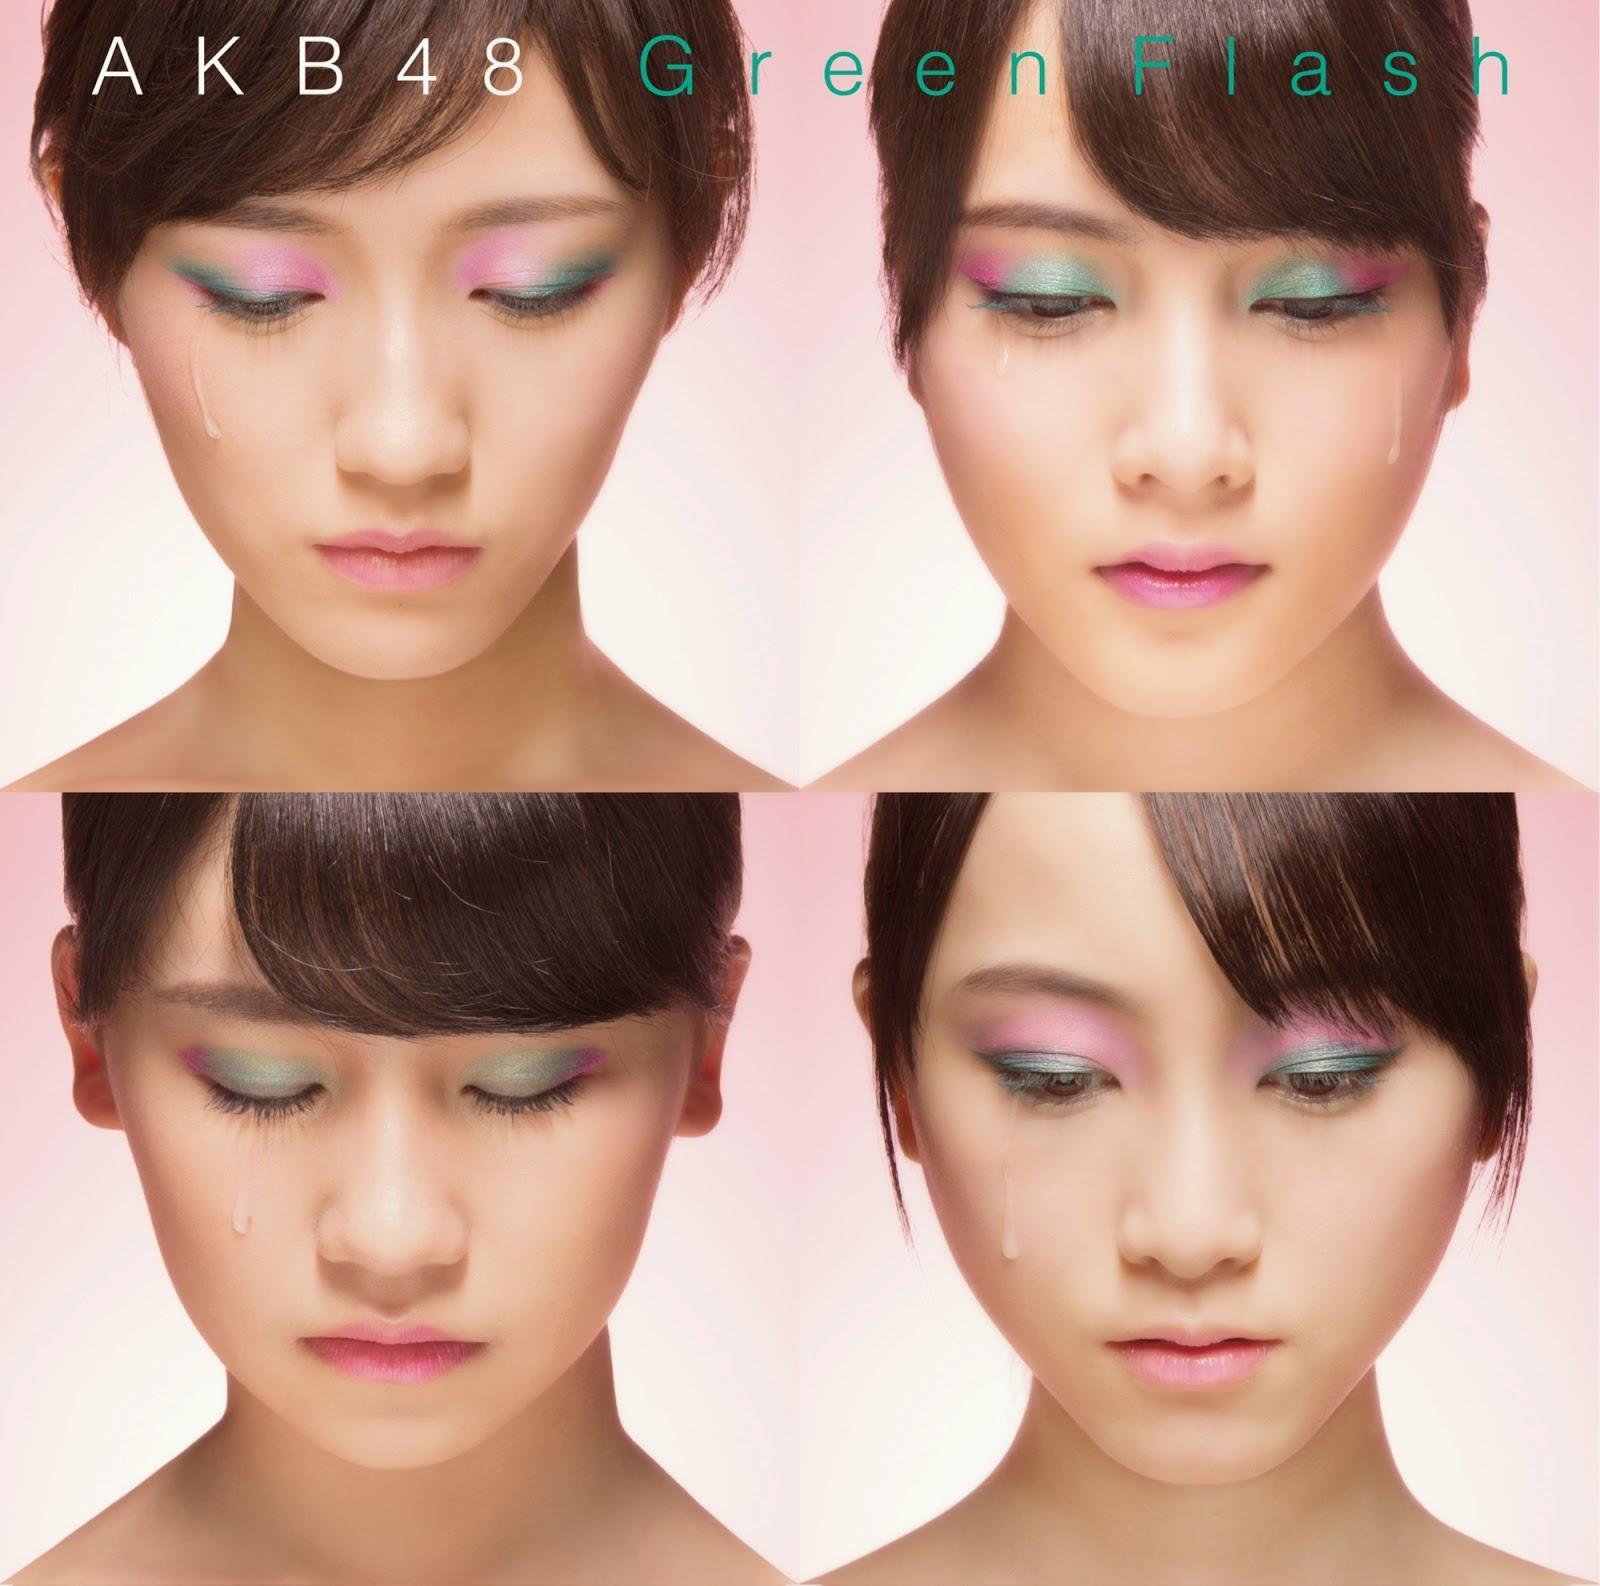 AKB48 挨拶から始めよう 歌詞 Aisatsu Kara Hajimeyou lyrics